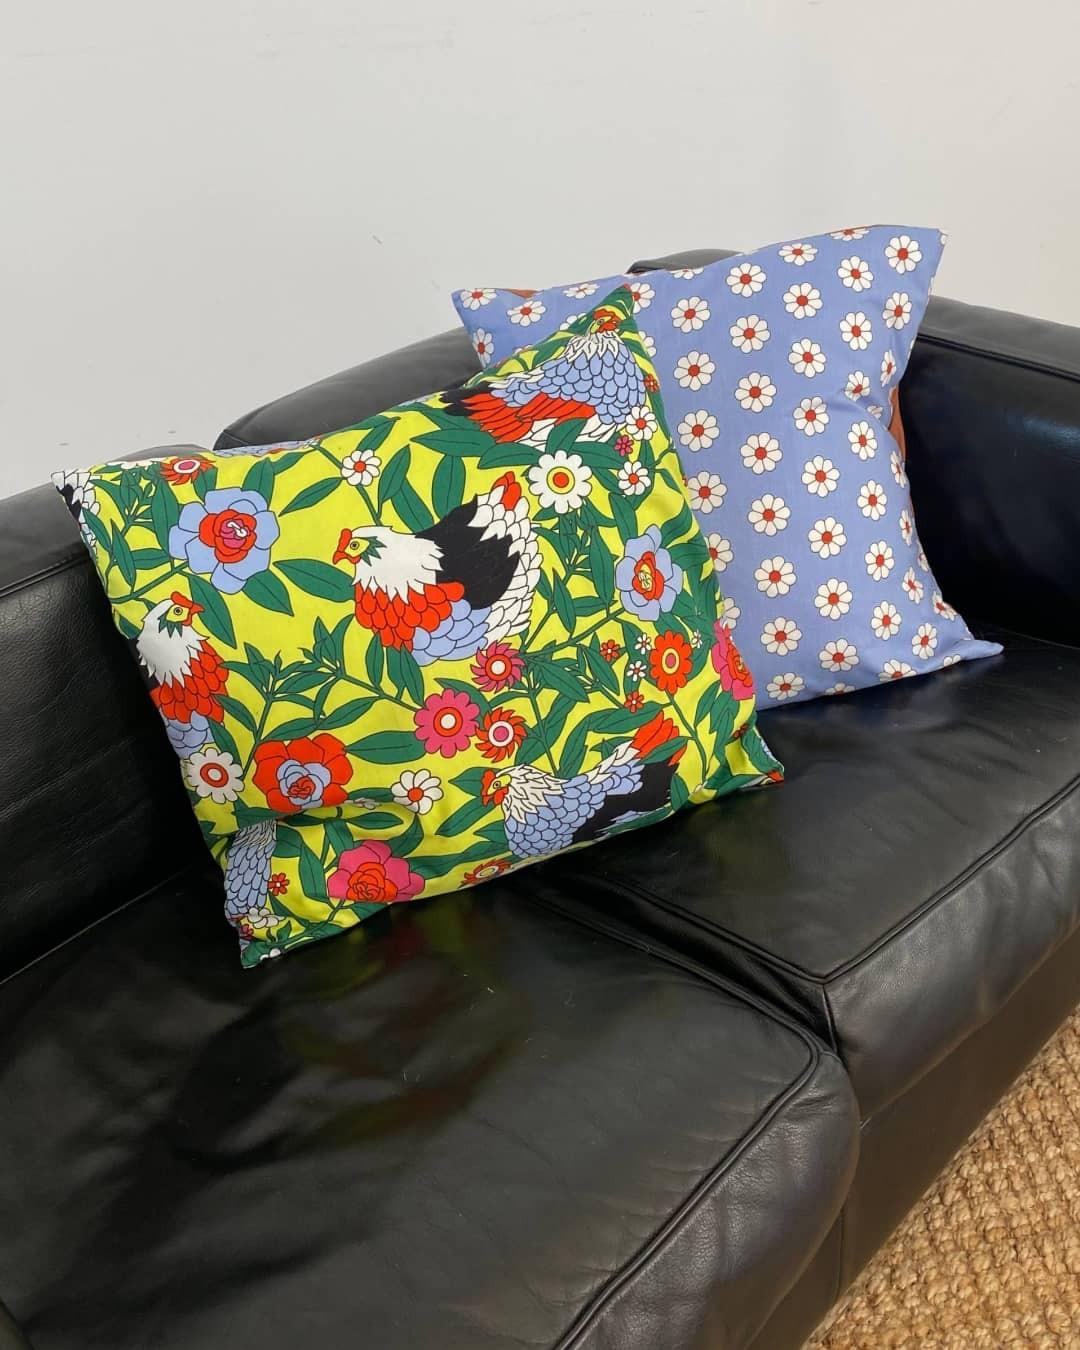 Two throw pillows on a black leather sofa